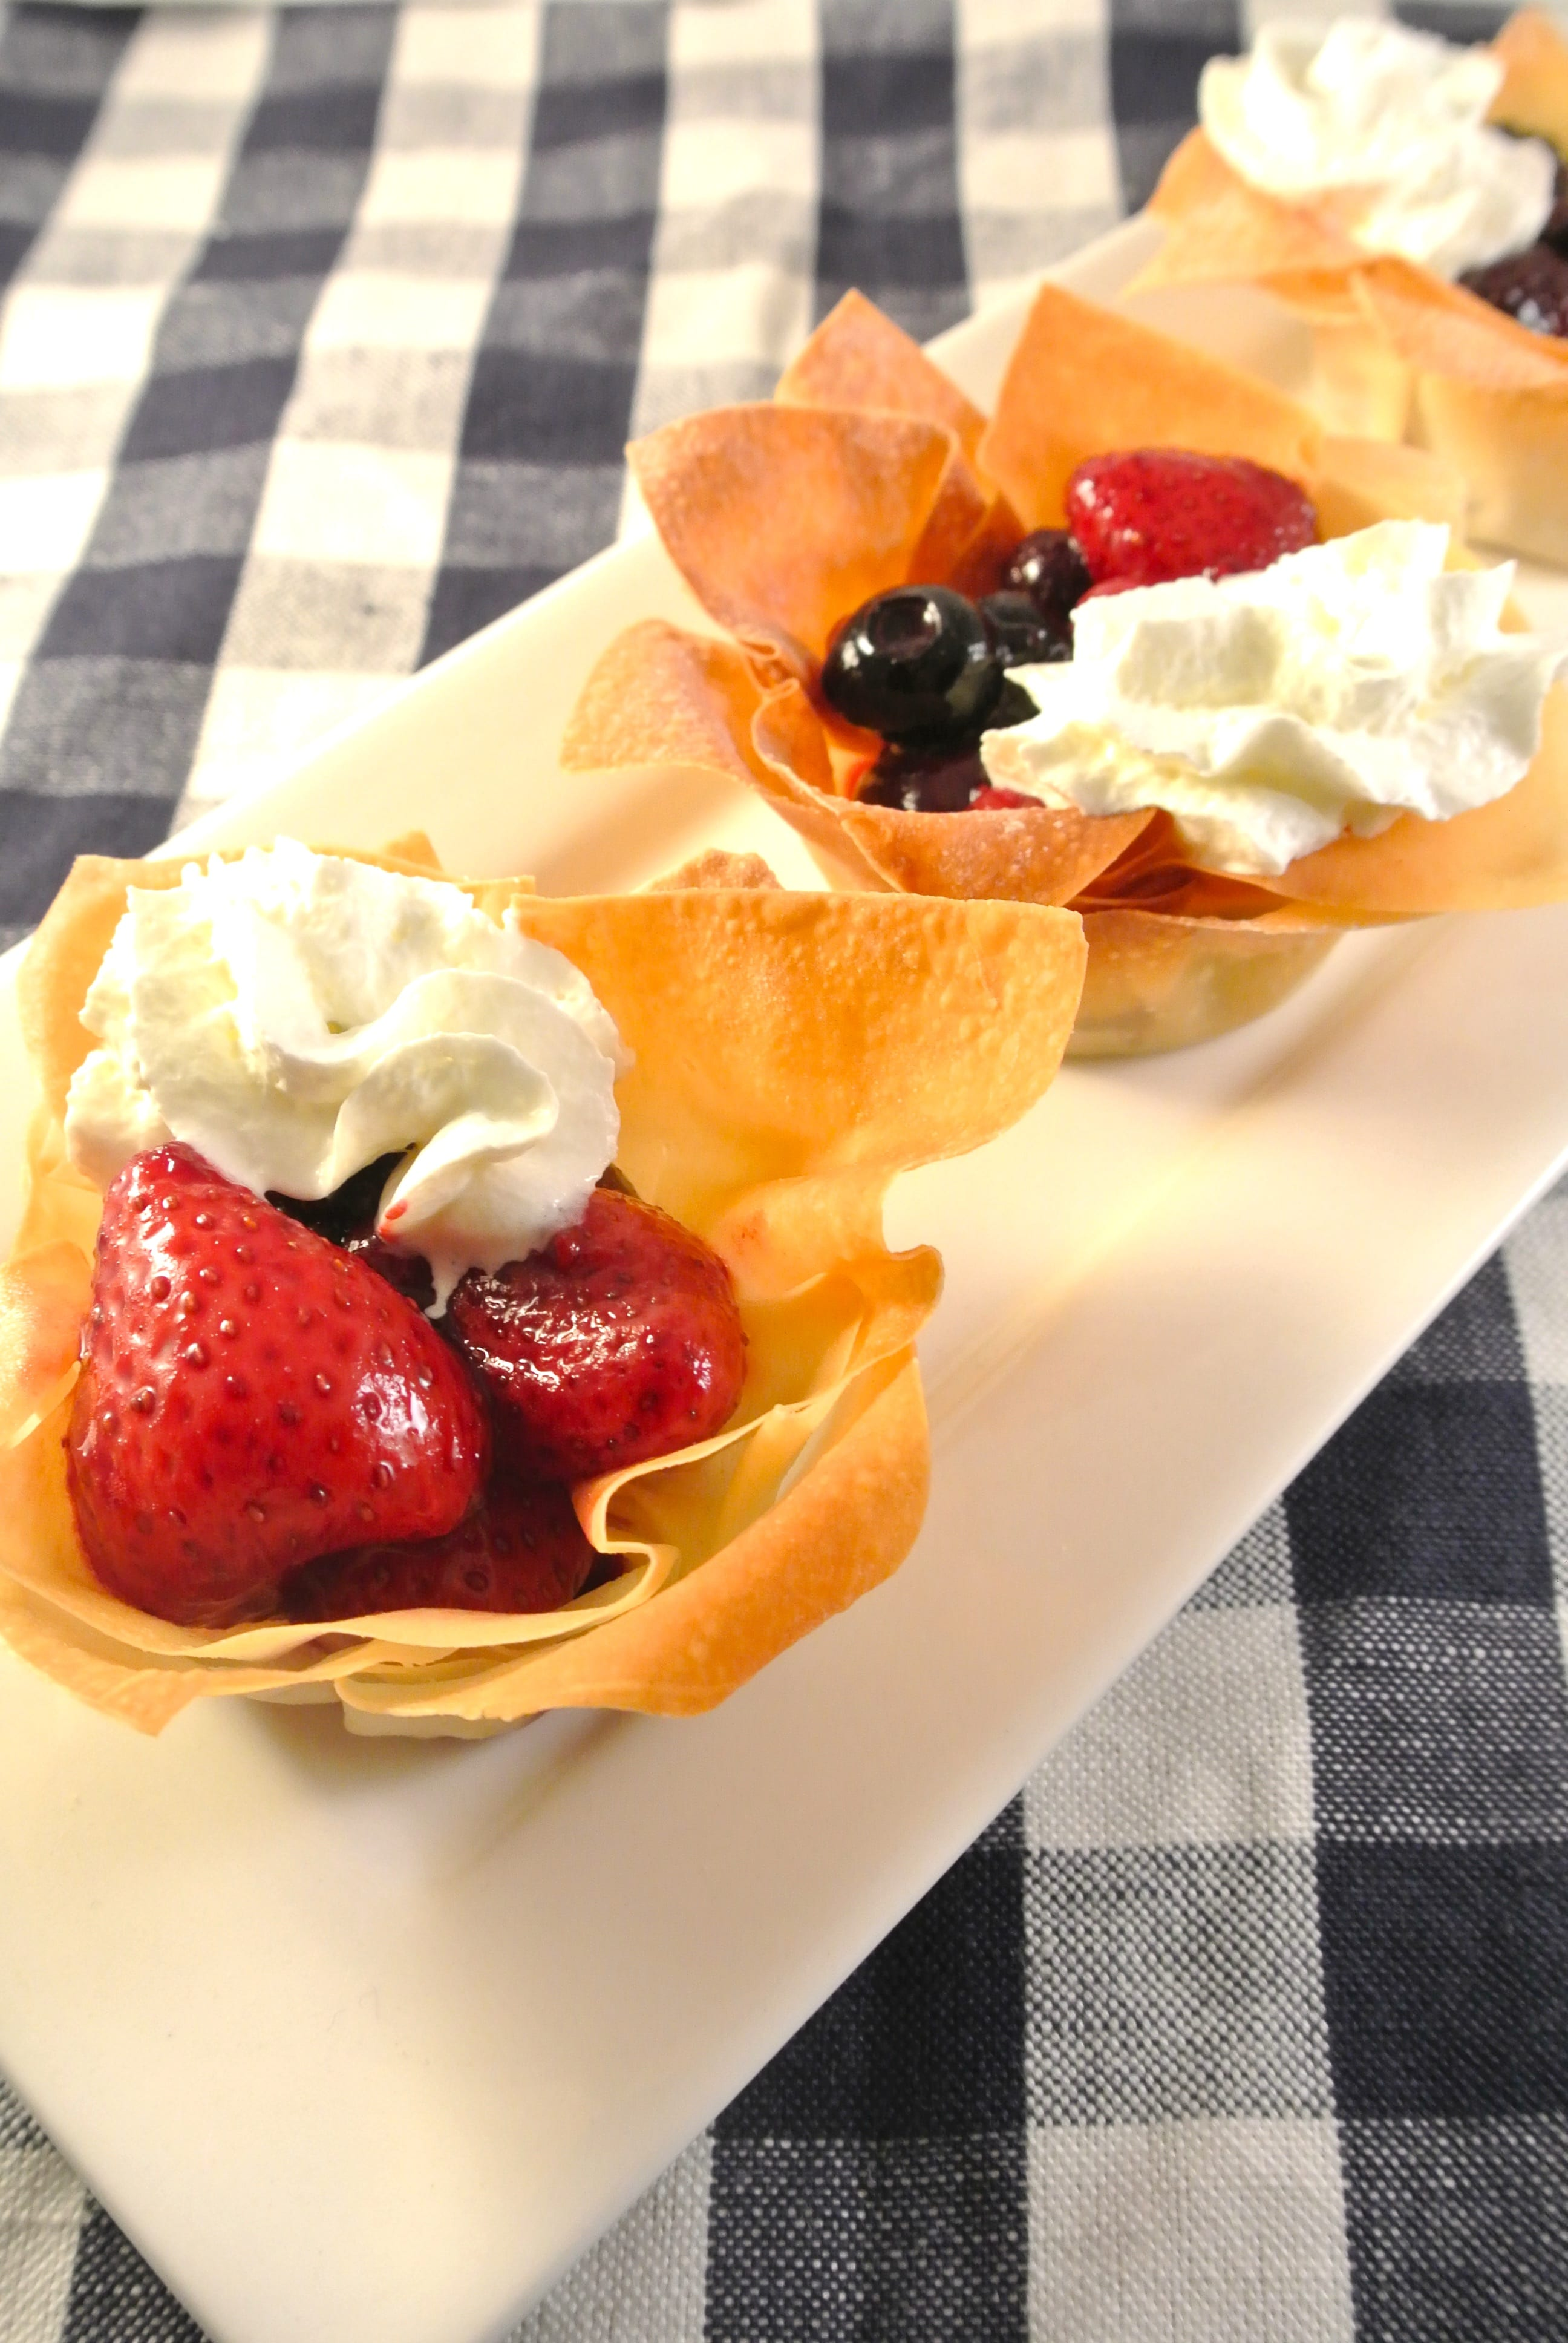 Warme fruitbakjes met slagroom